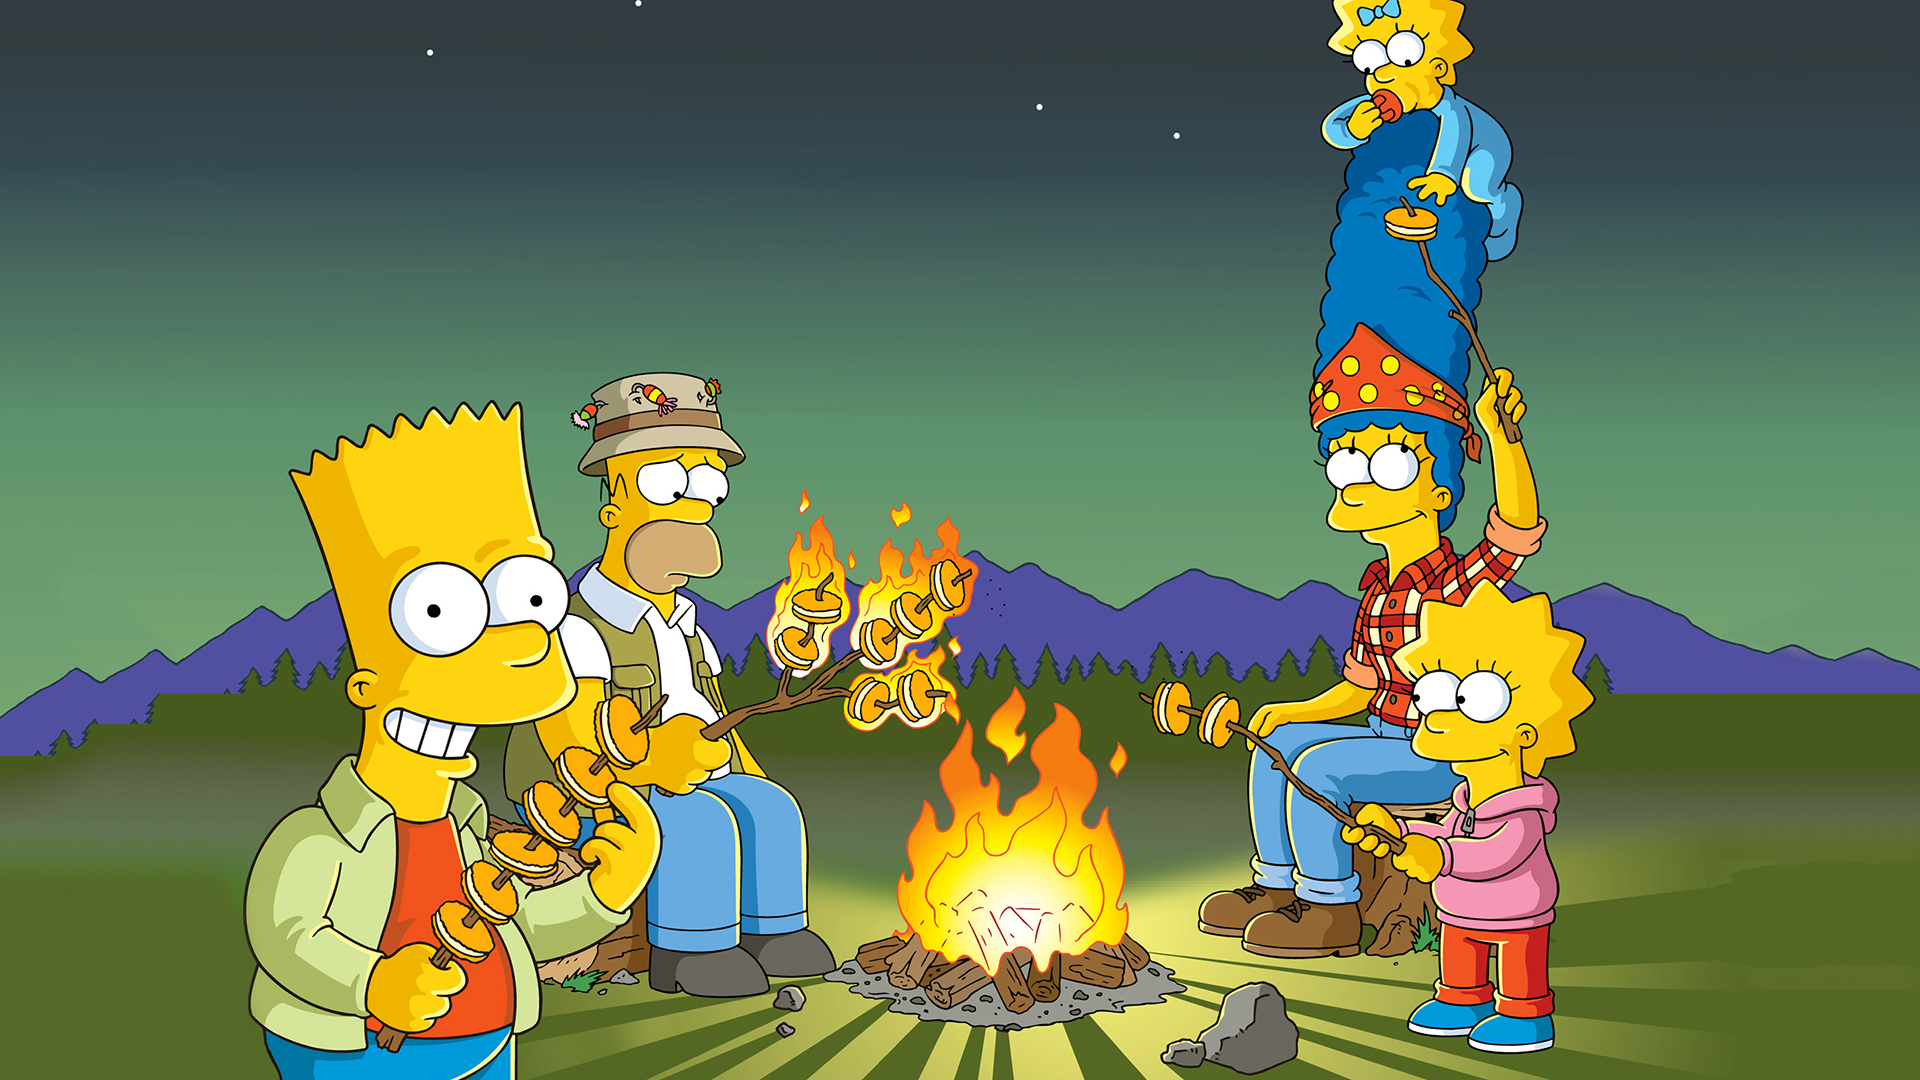 Os Simpsons Papel de Parede HD   Plano de Fundo   1920x1200